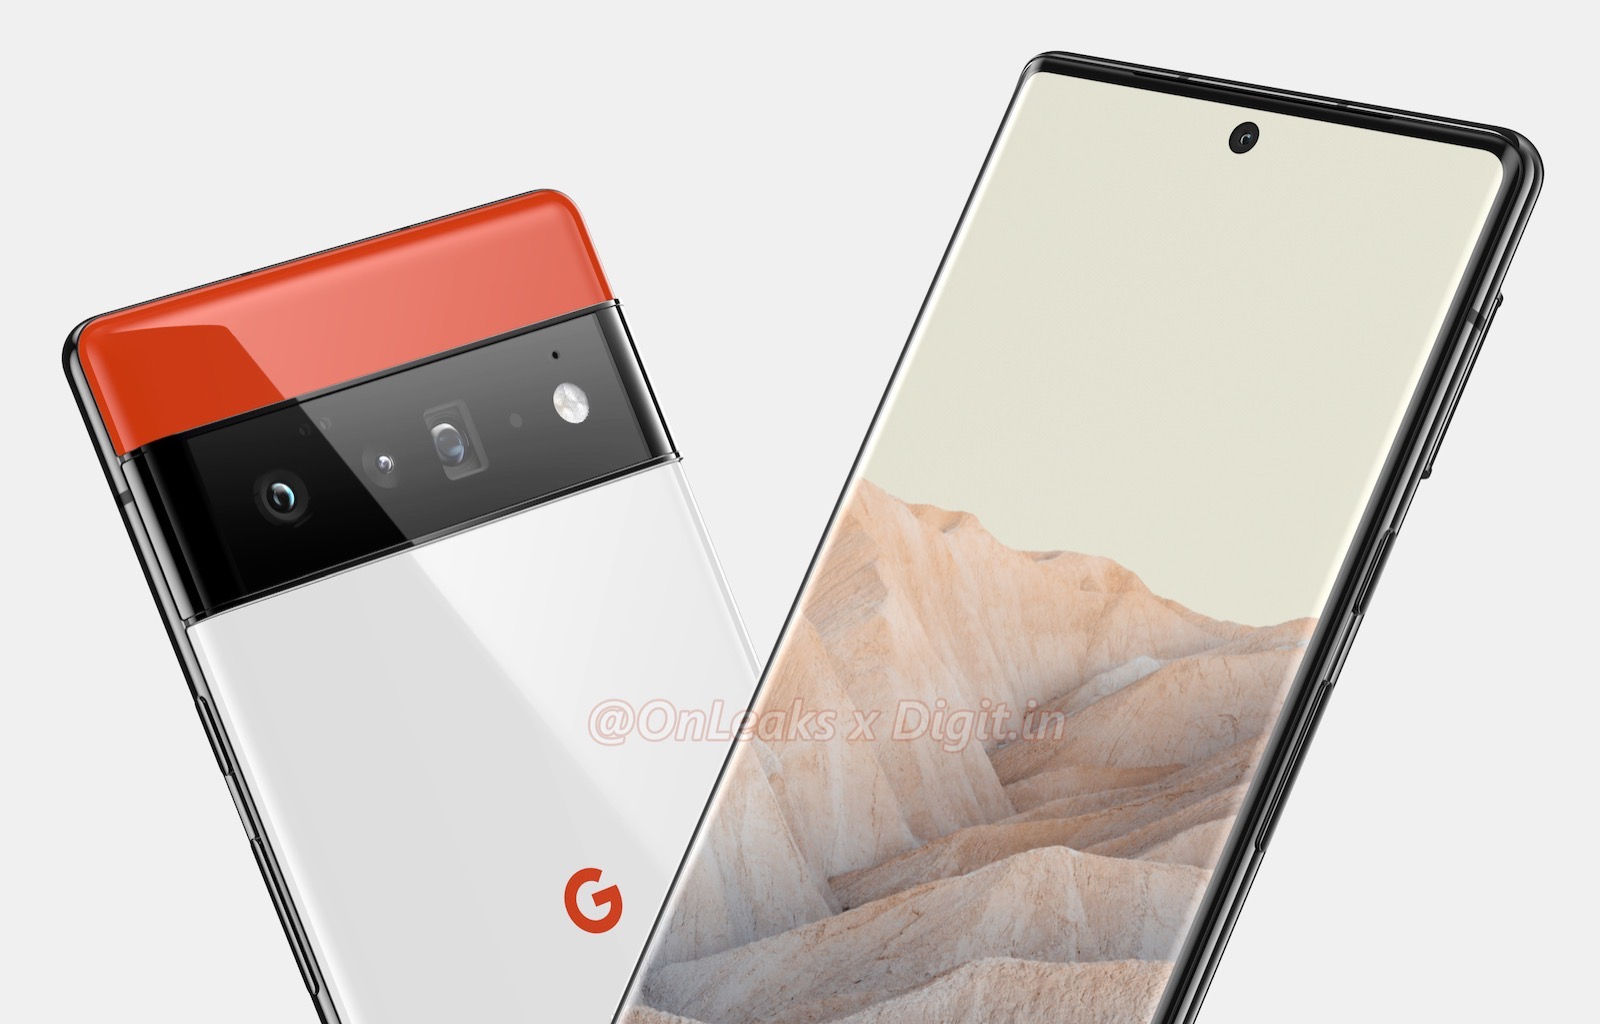 pixel6pro-new-rendering-images.jpeg